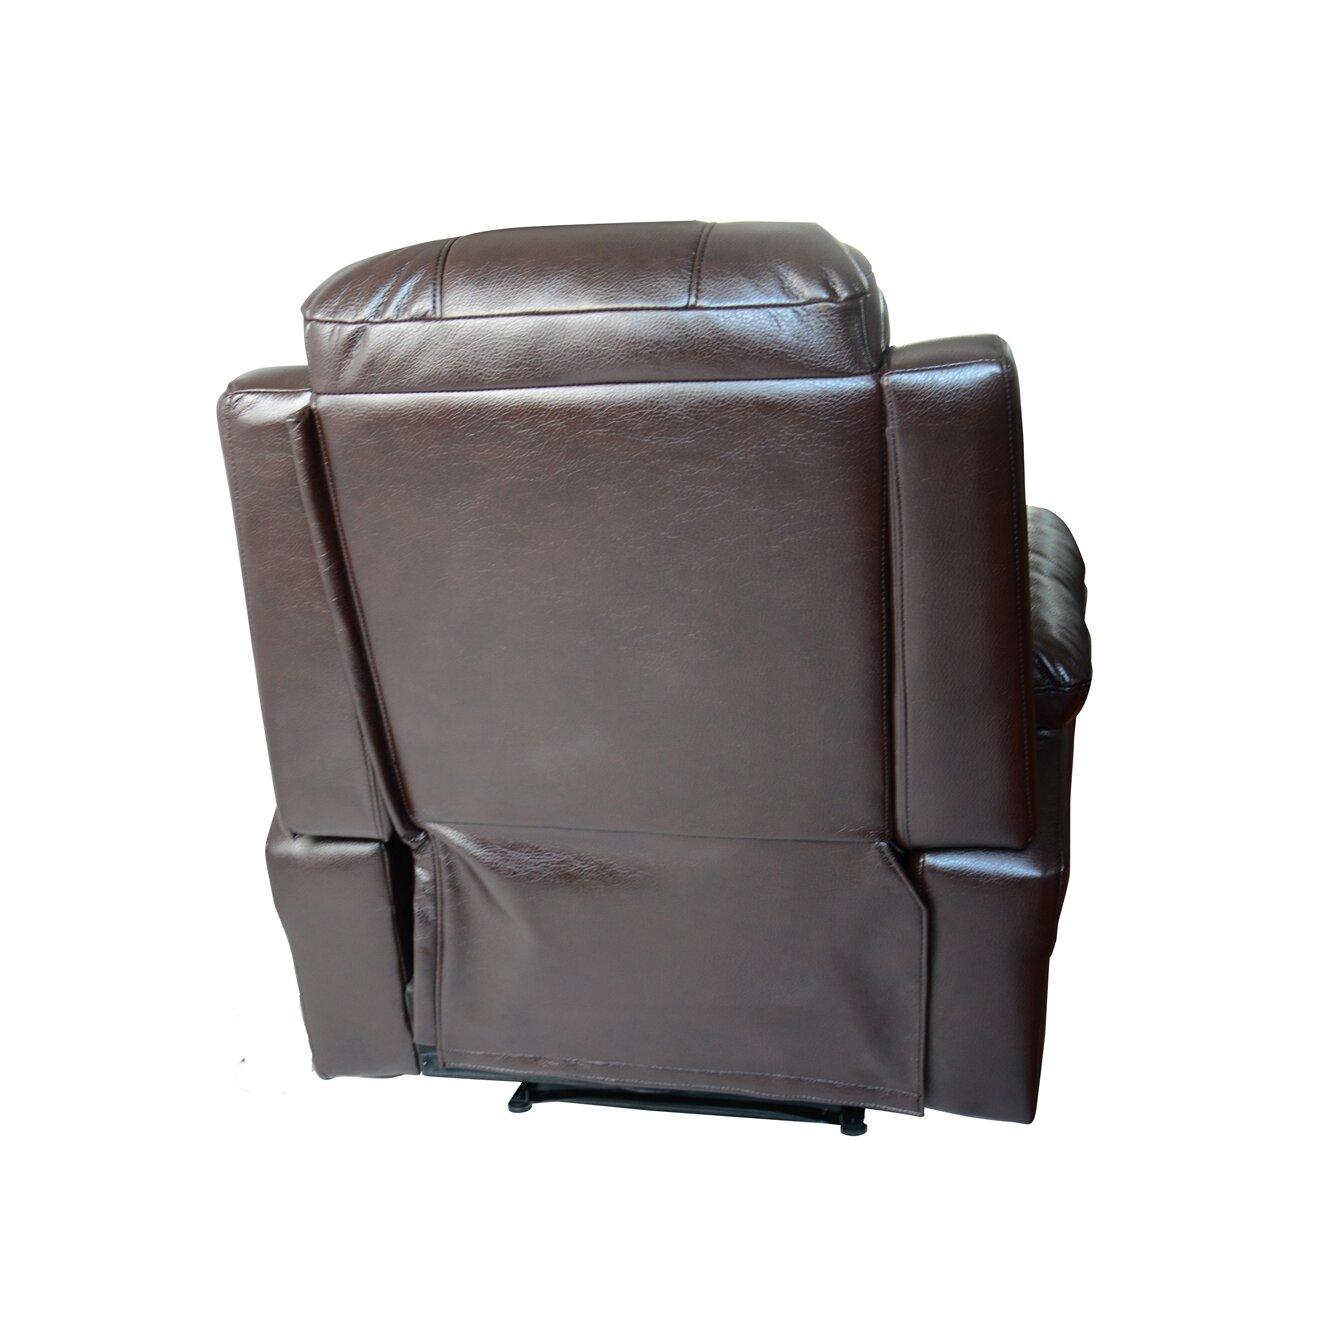 Newacme LLC MCombo Vibrating Swivel Reclining Massage Chair With Heated Loung